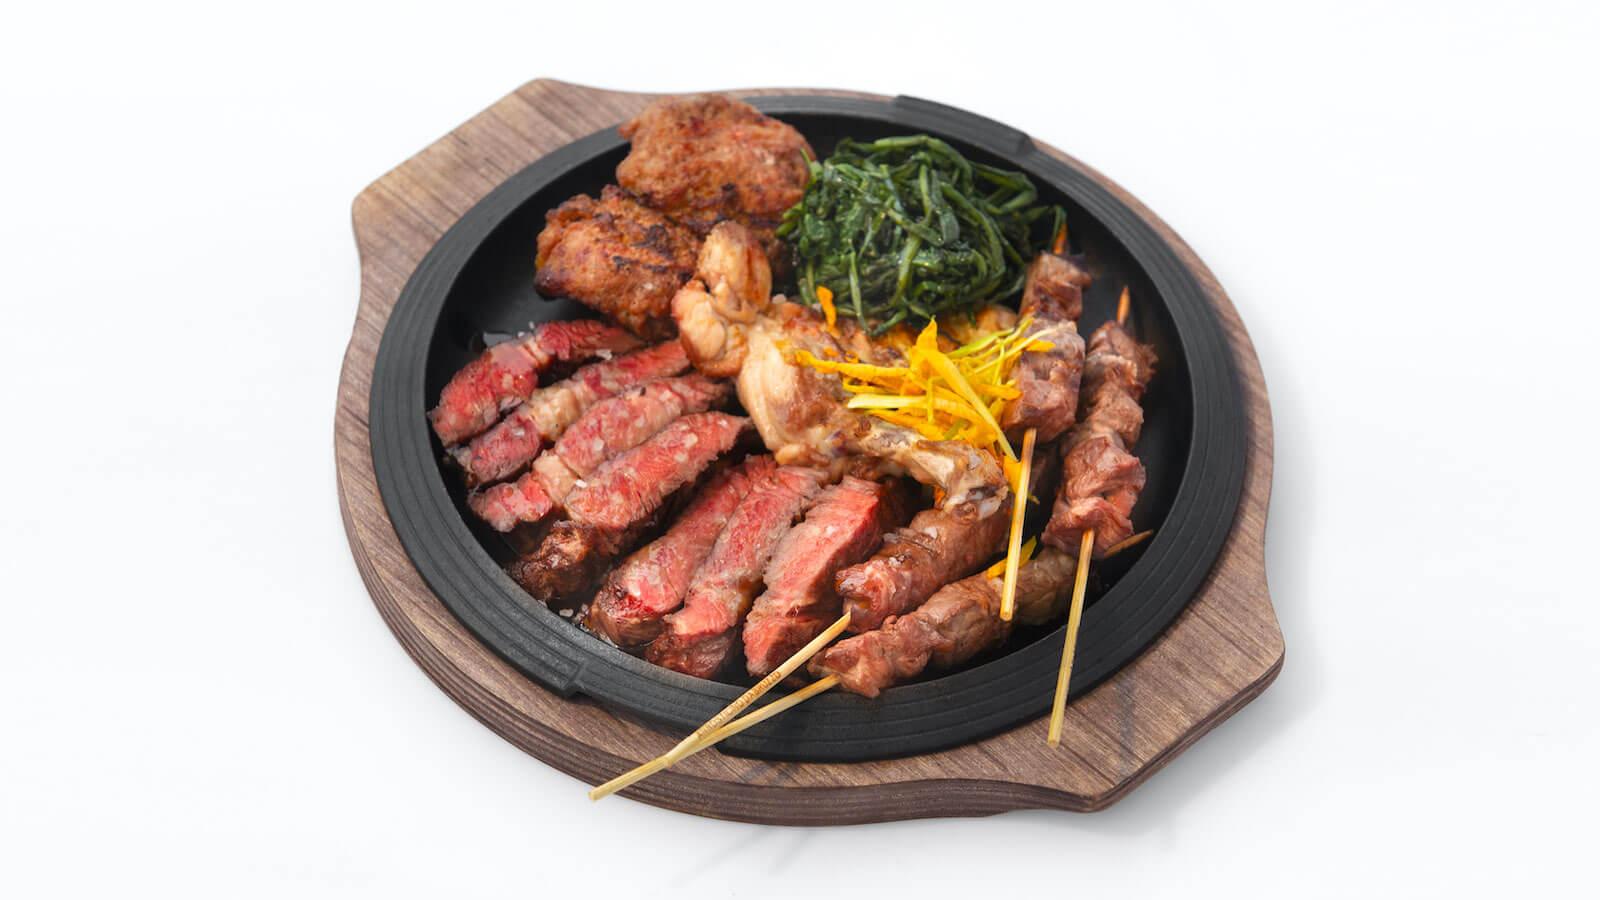 Grigliata di Carne con Arrosticini